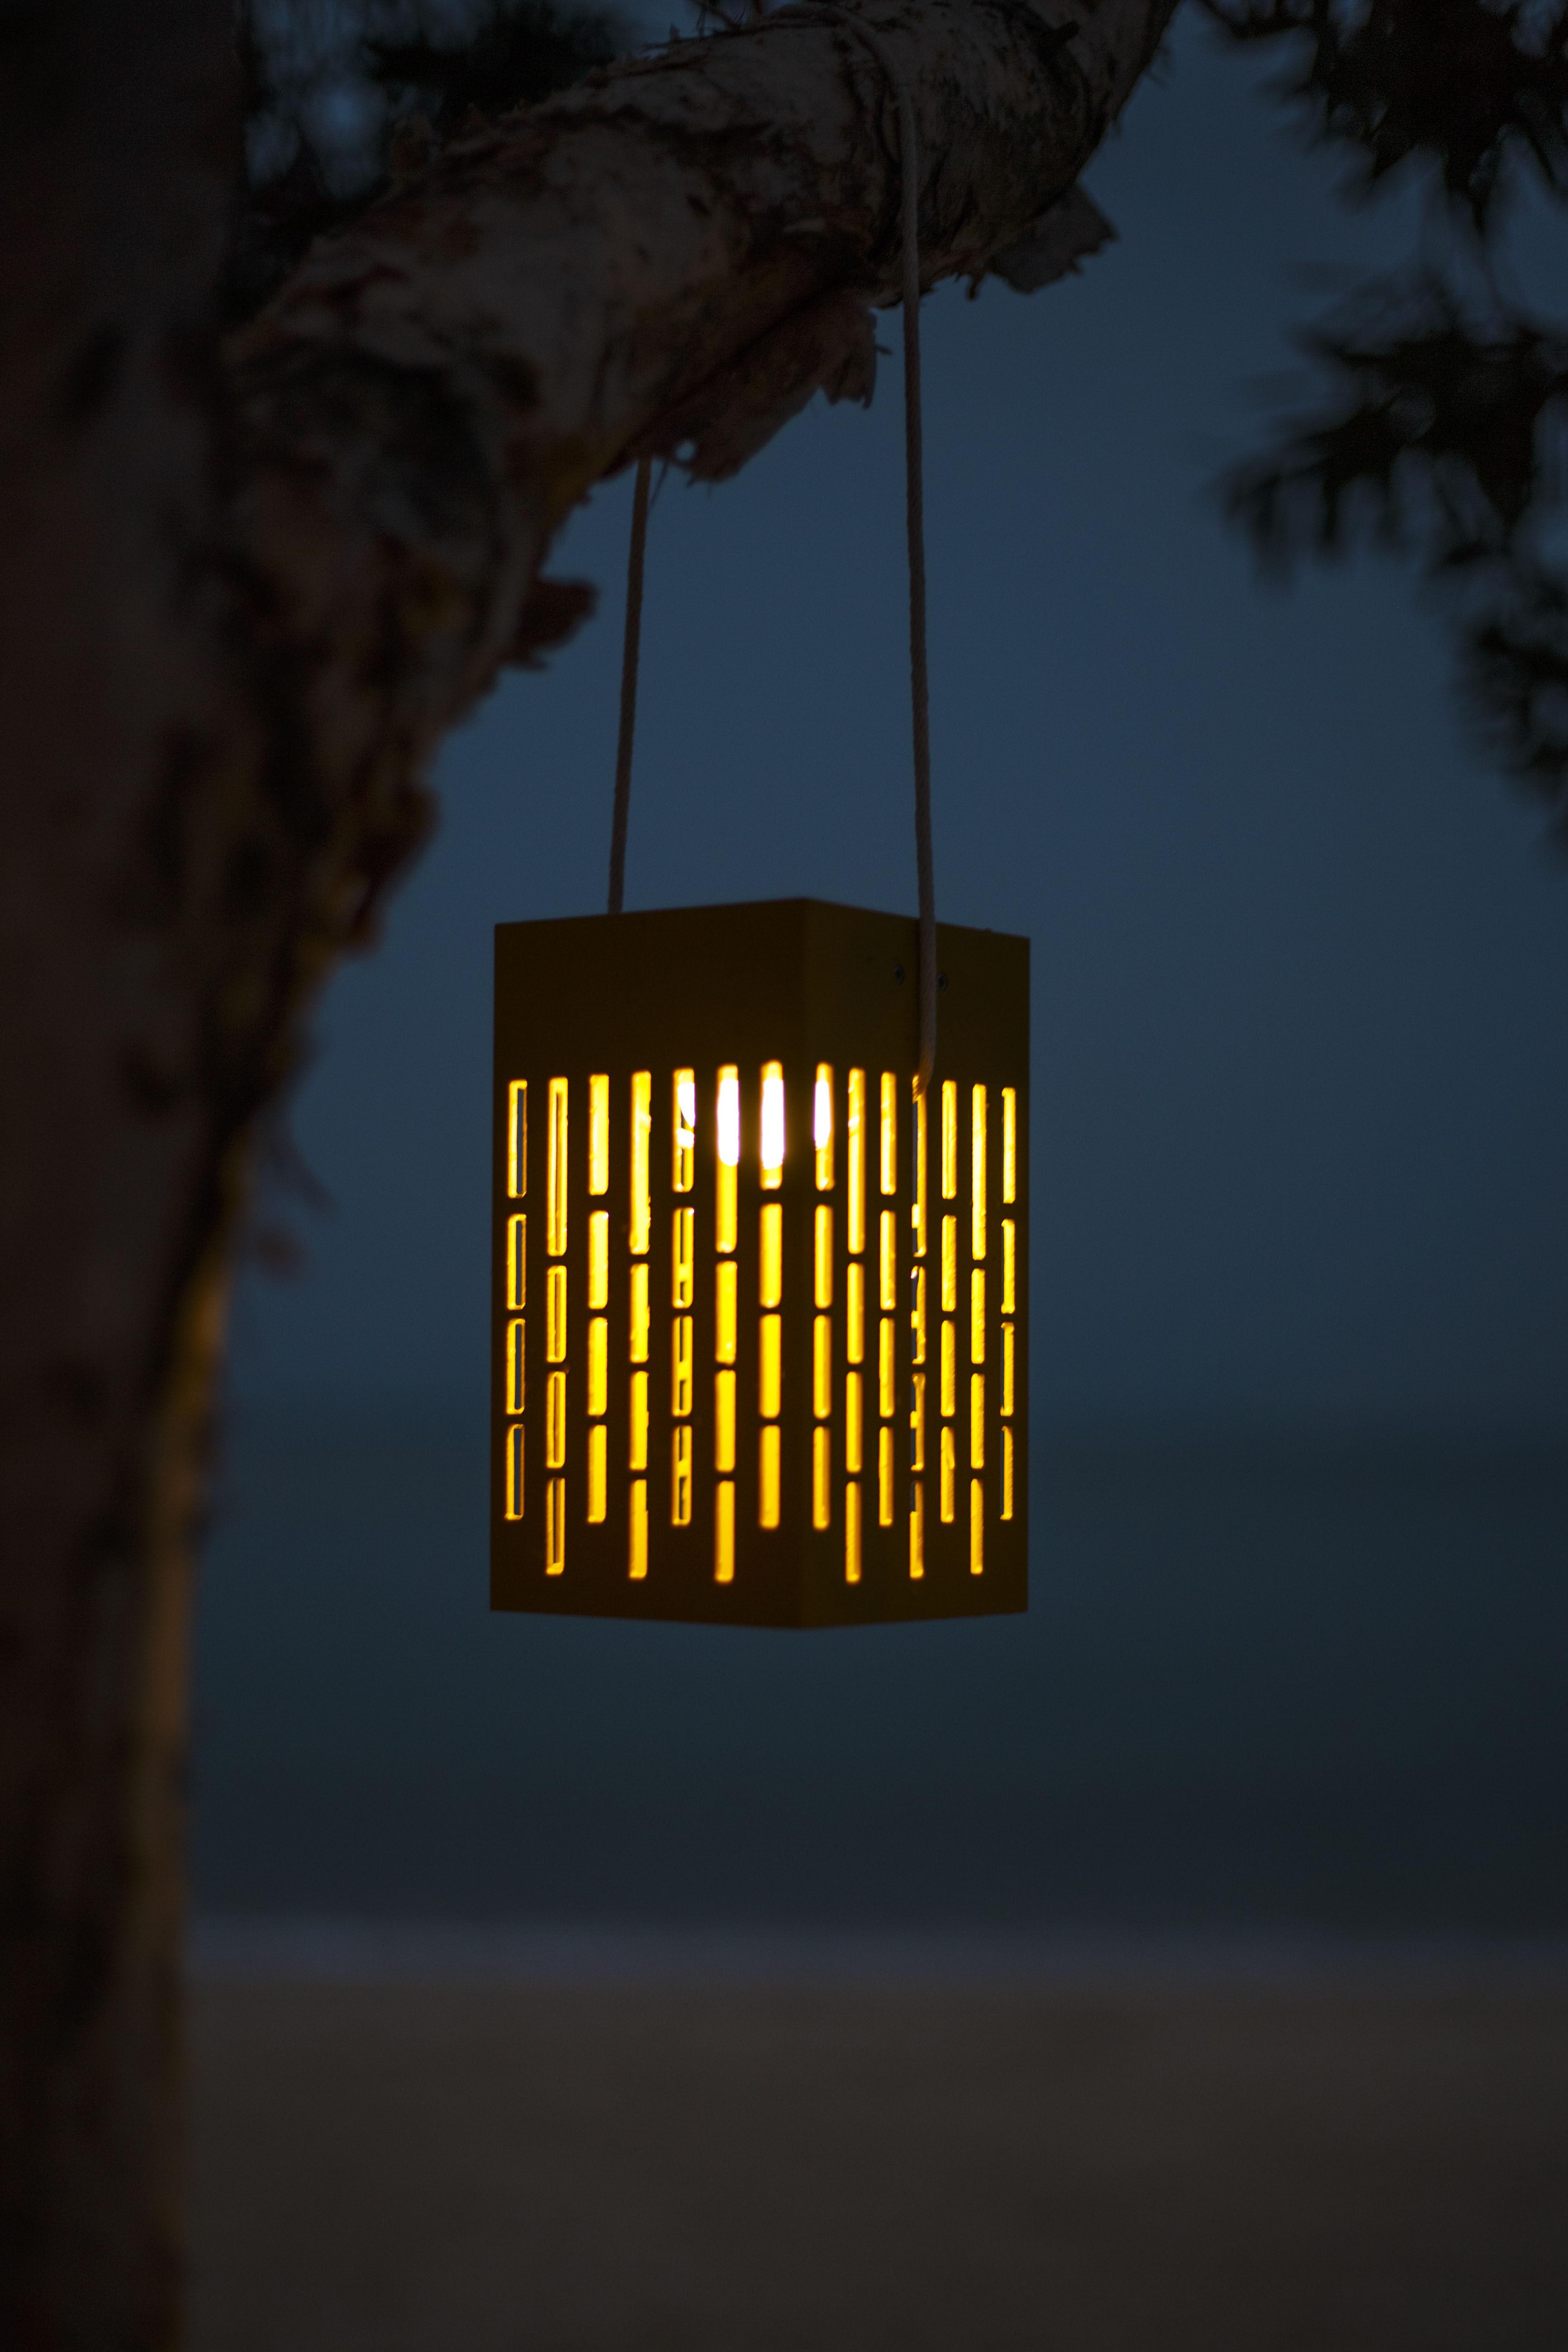 Pose Sans La 04 Fil Lampe Dock Usb Solaire Maiori Led Y7y6Ibfgv